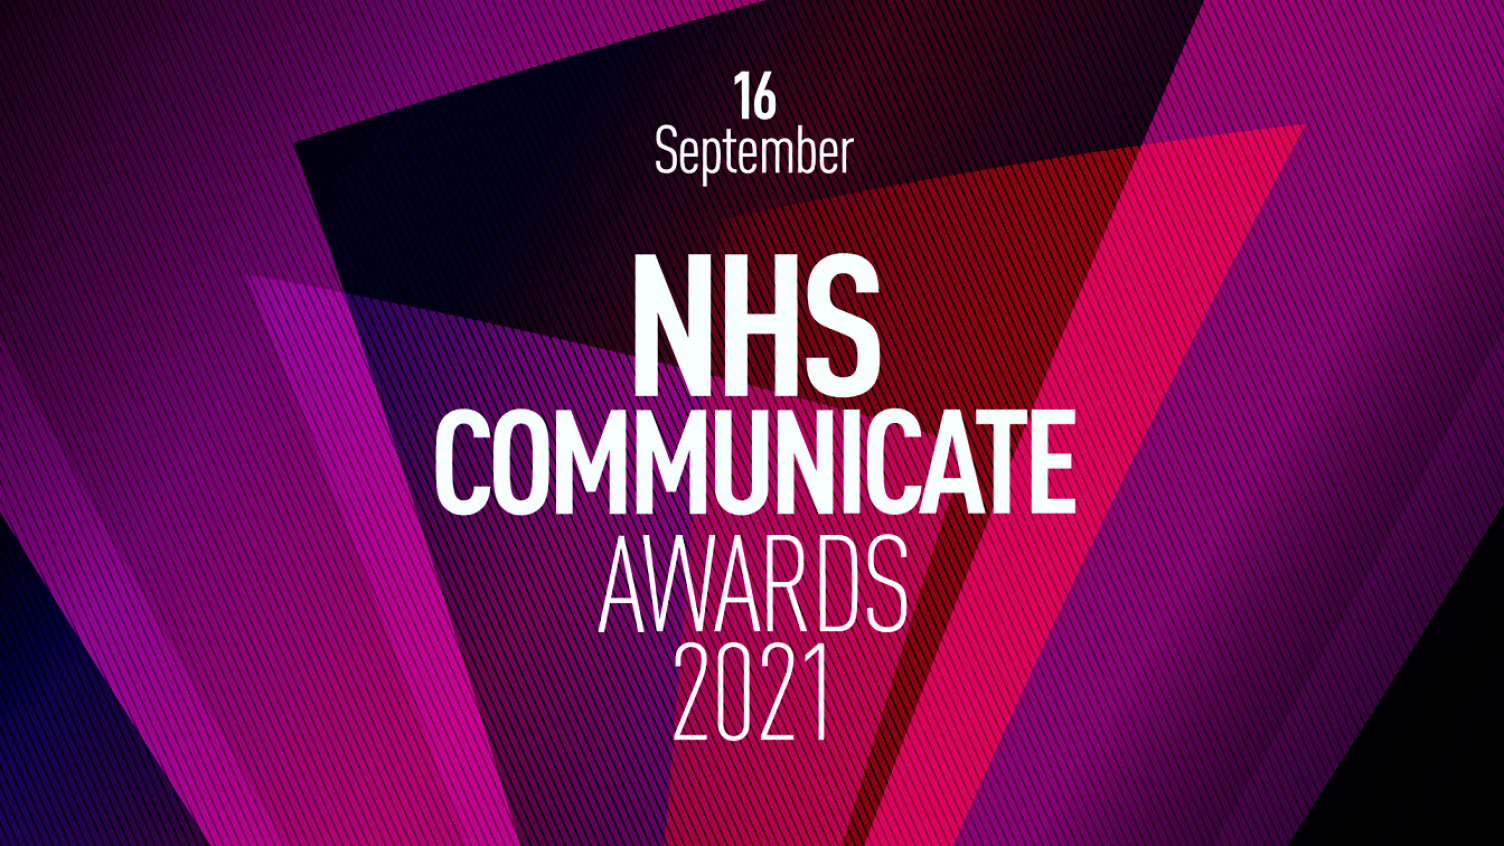 Logo for NHS communicate awards 2021